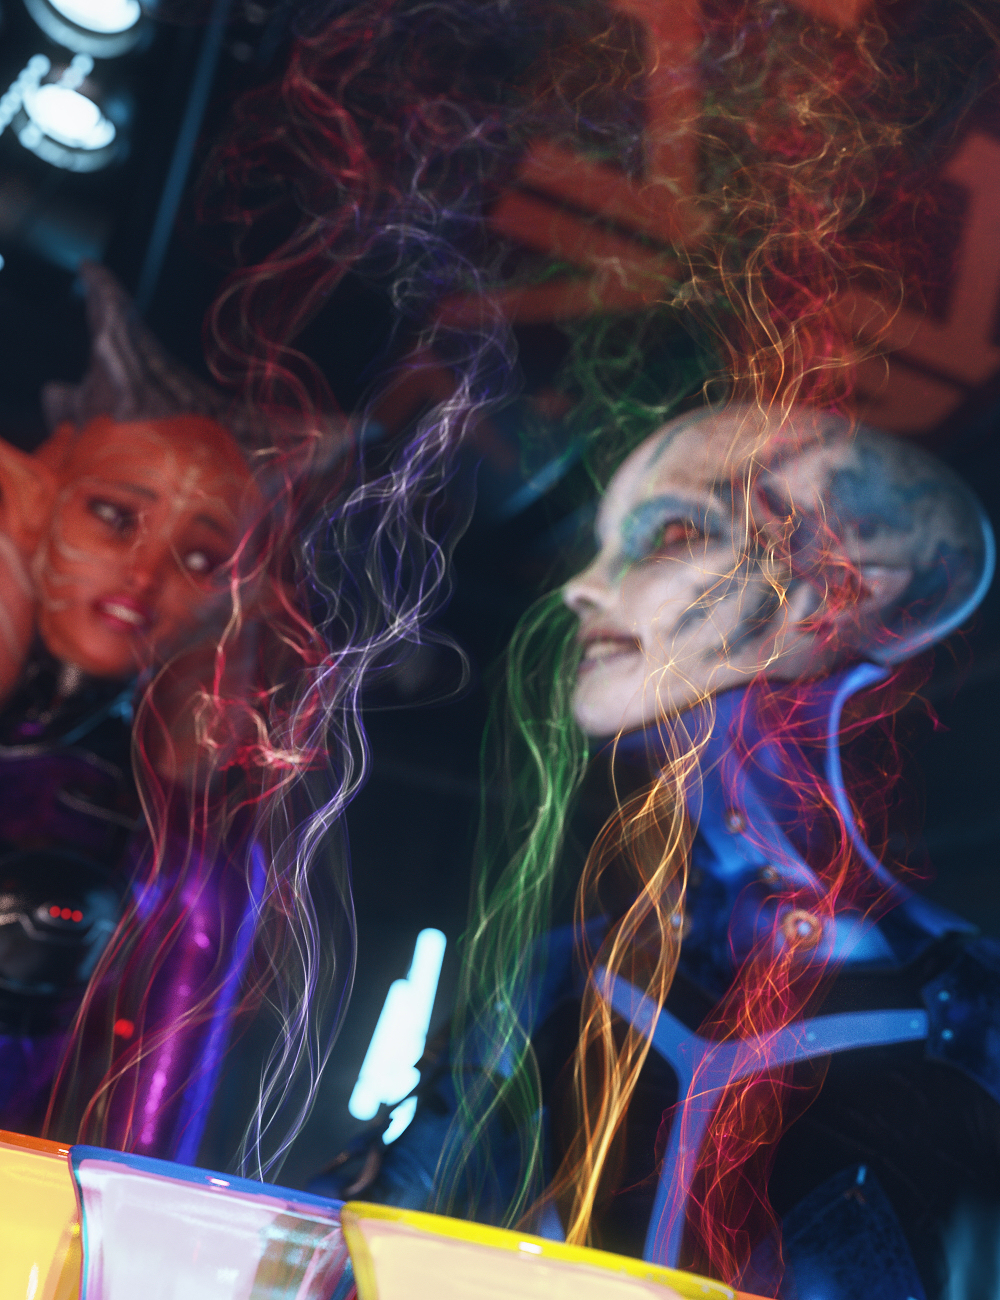 MMX Smoke Trails 3 for Iray by: Mattymanx, 3D Models by Daz 3D